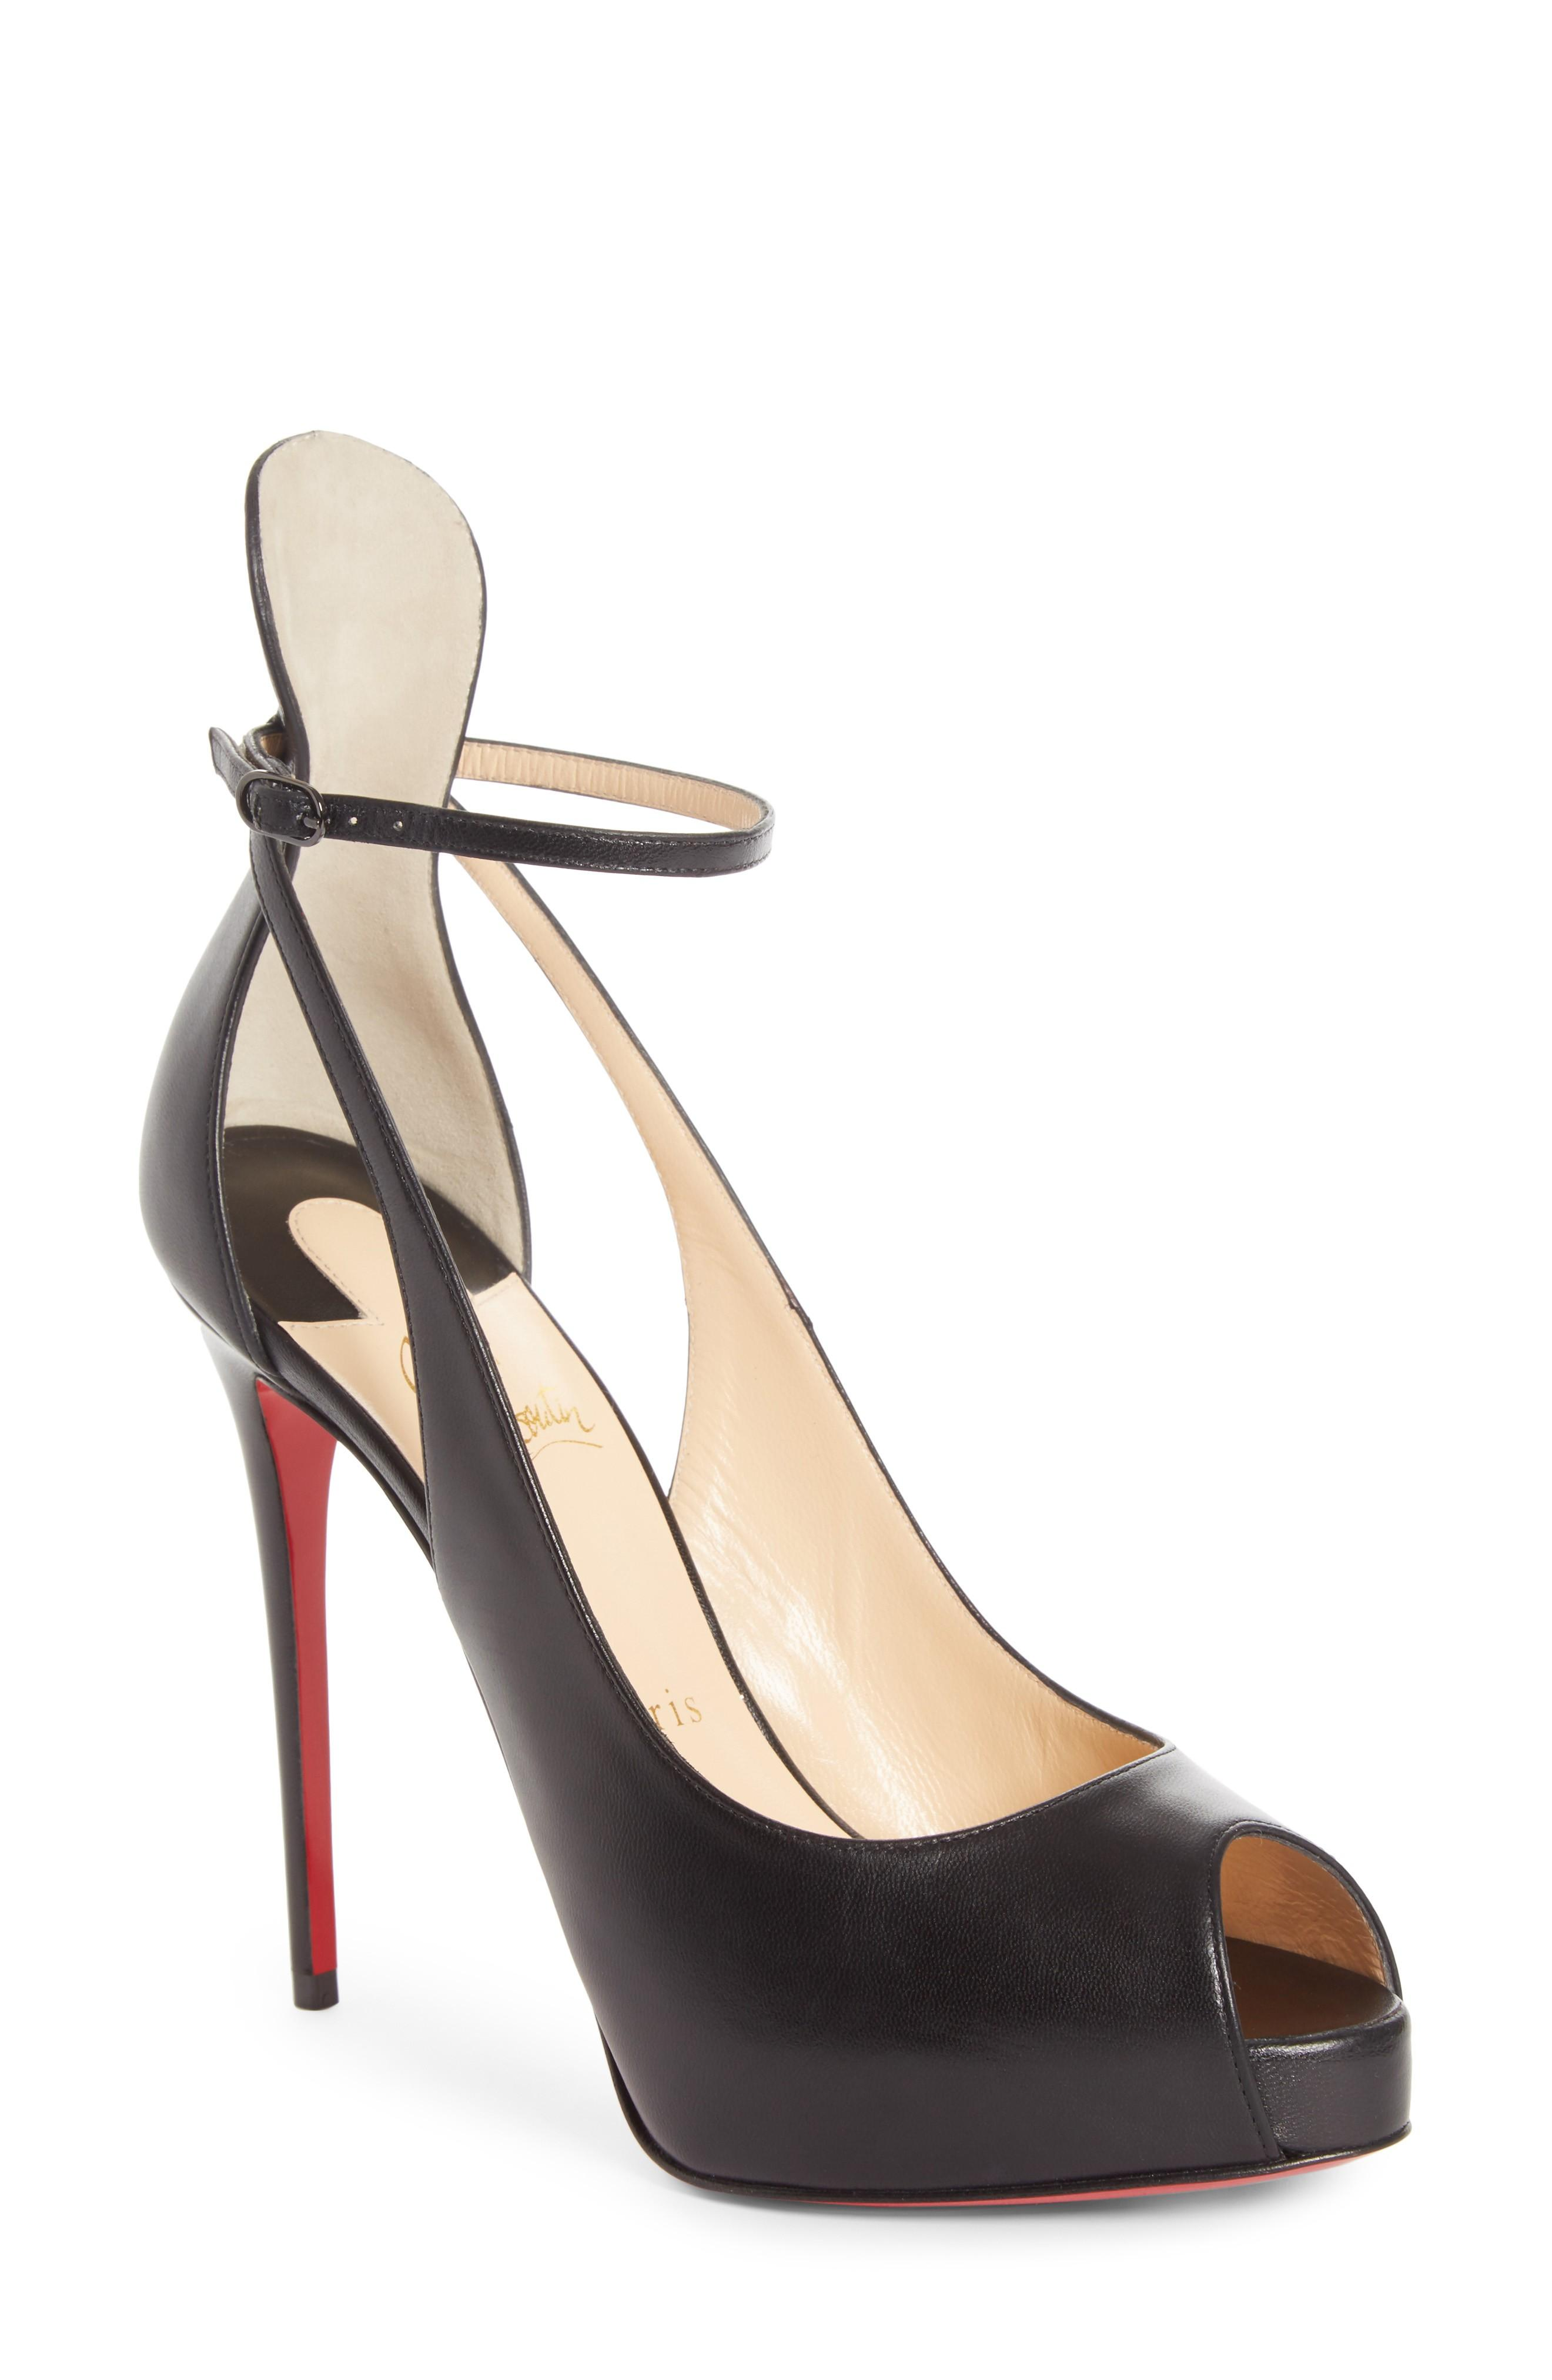 2a71ec29e55 Mascaralta Platform Peep-Toe Red Sole Sandals in Black